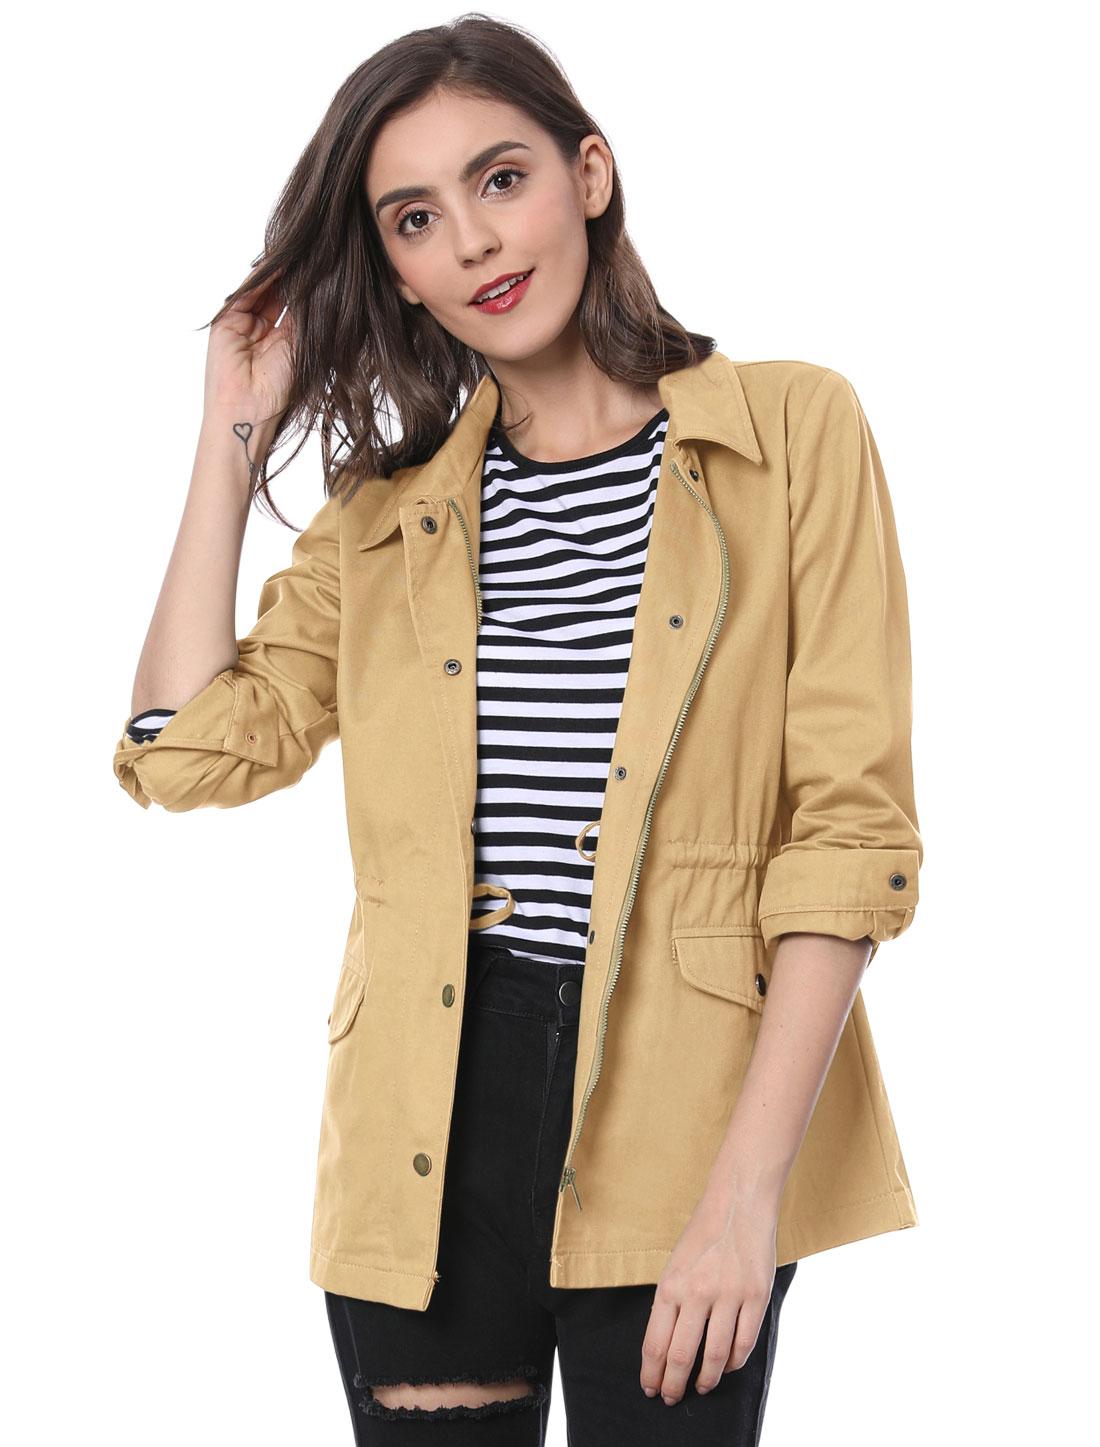 Women's Drawstring Waist Flap Pockets Lightweight Utility Jacket Khaki XL